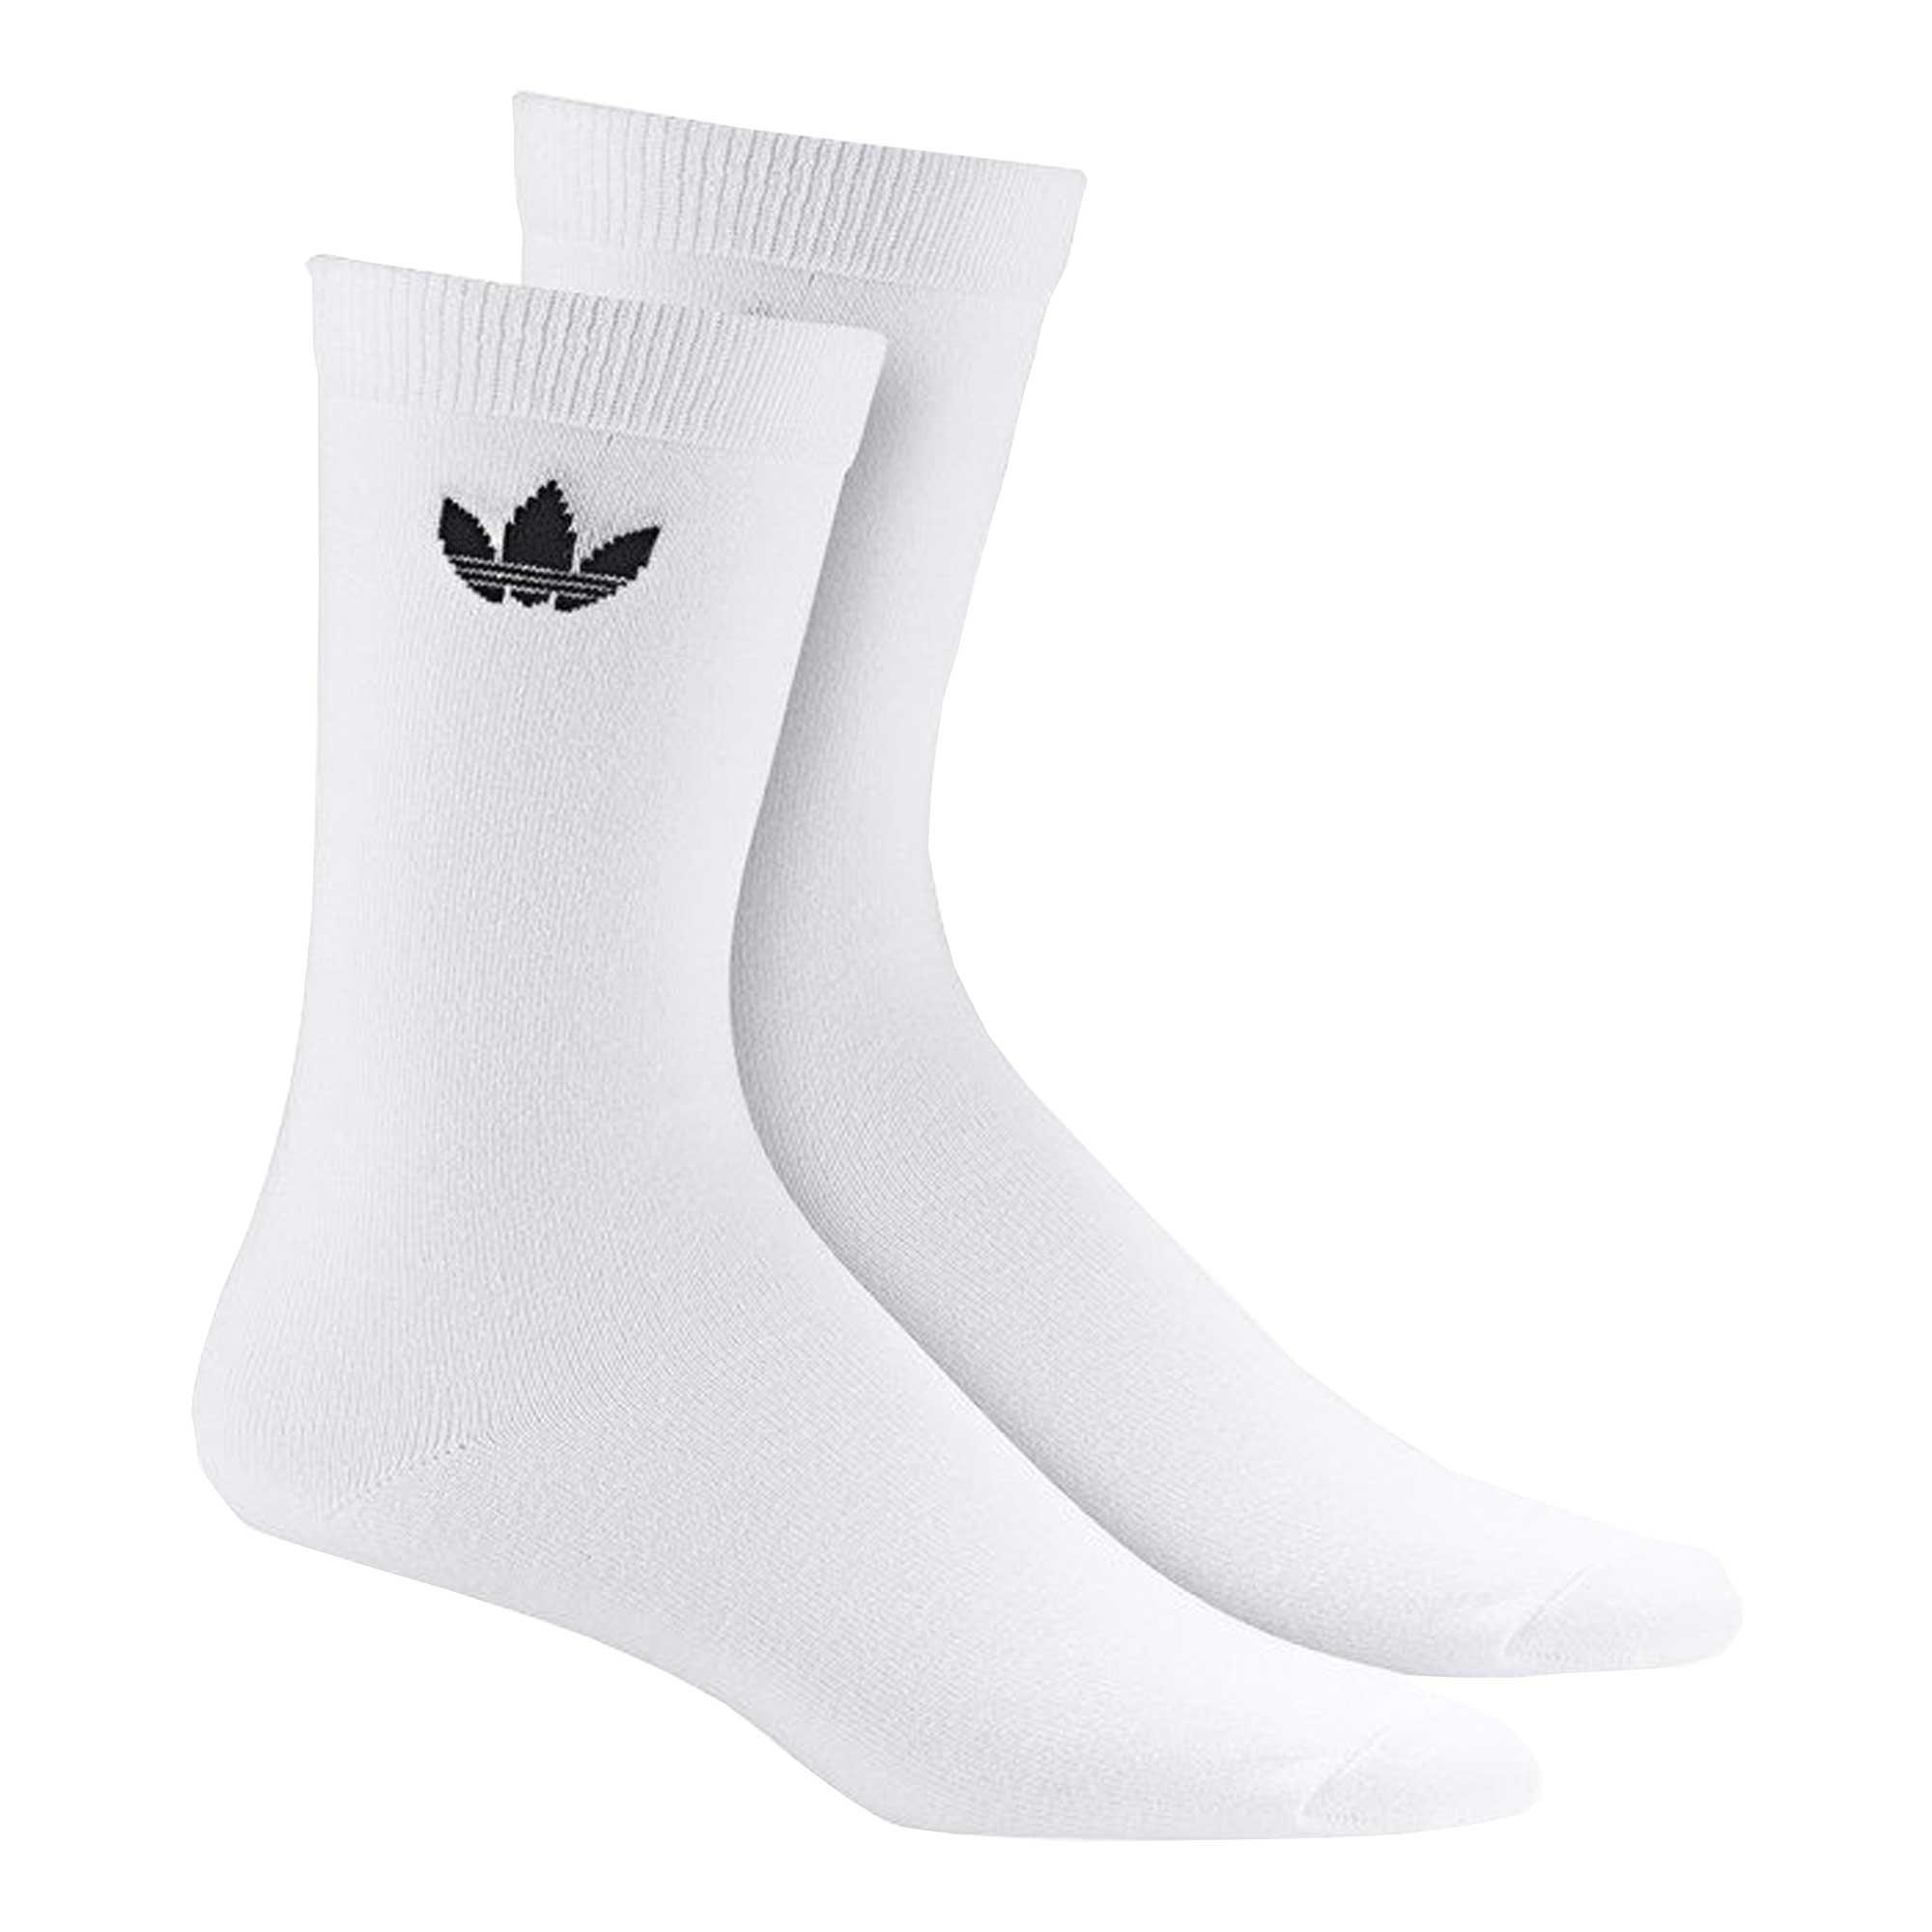 lana Acorazado mayor  adidas Originals Thin Trefoil Crew Socks 2 Pairs | White | DV1728-THN